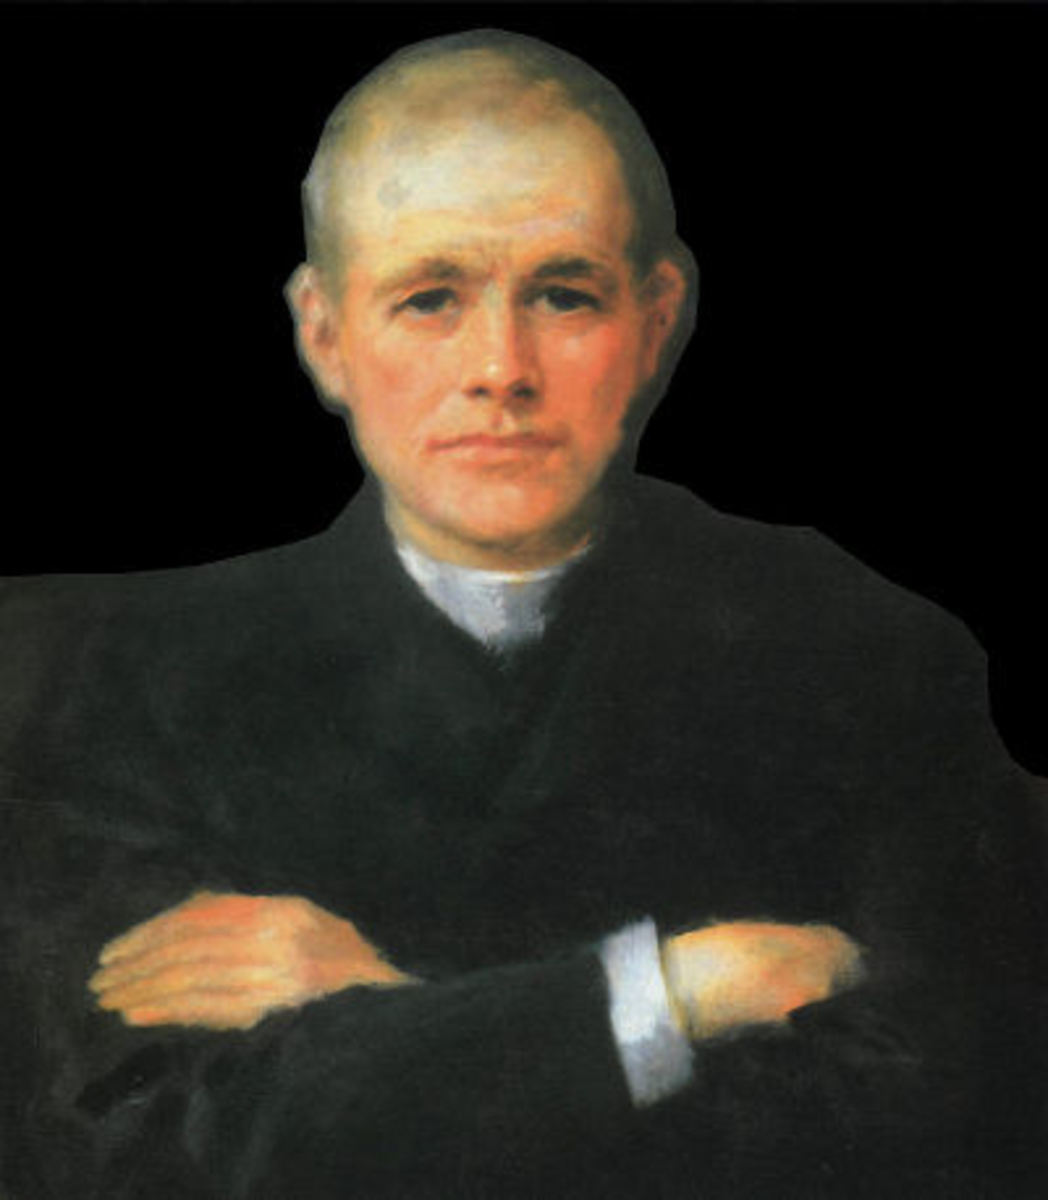 Patrick Dinneen - father of leprechaun  oil portrait by Yeats